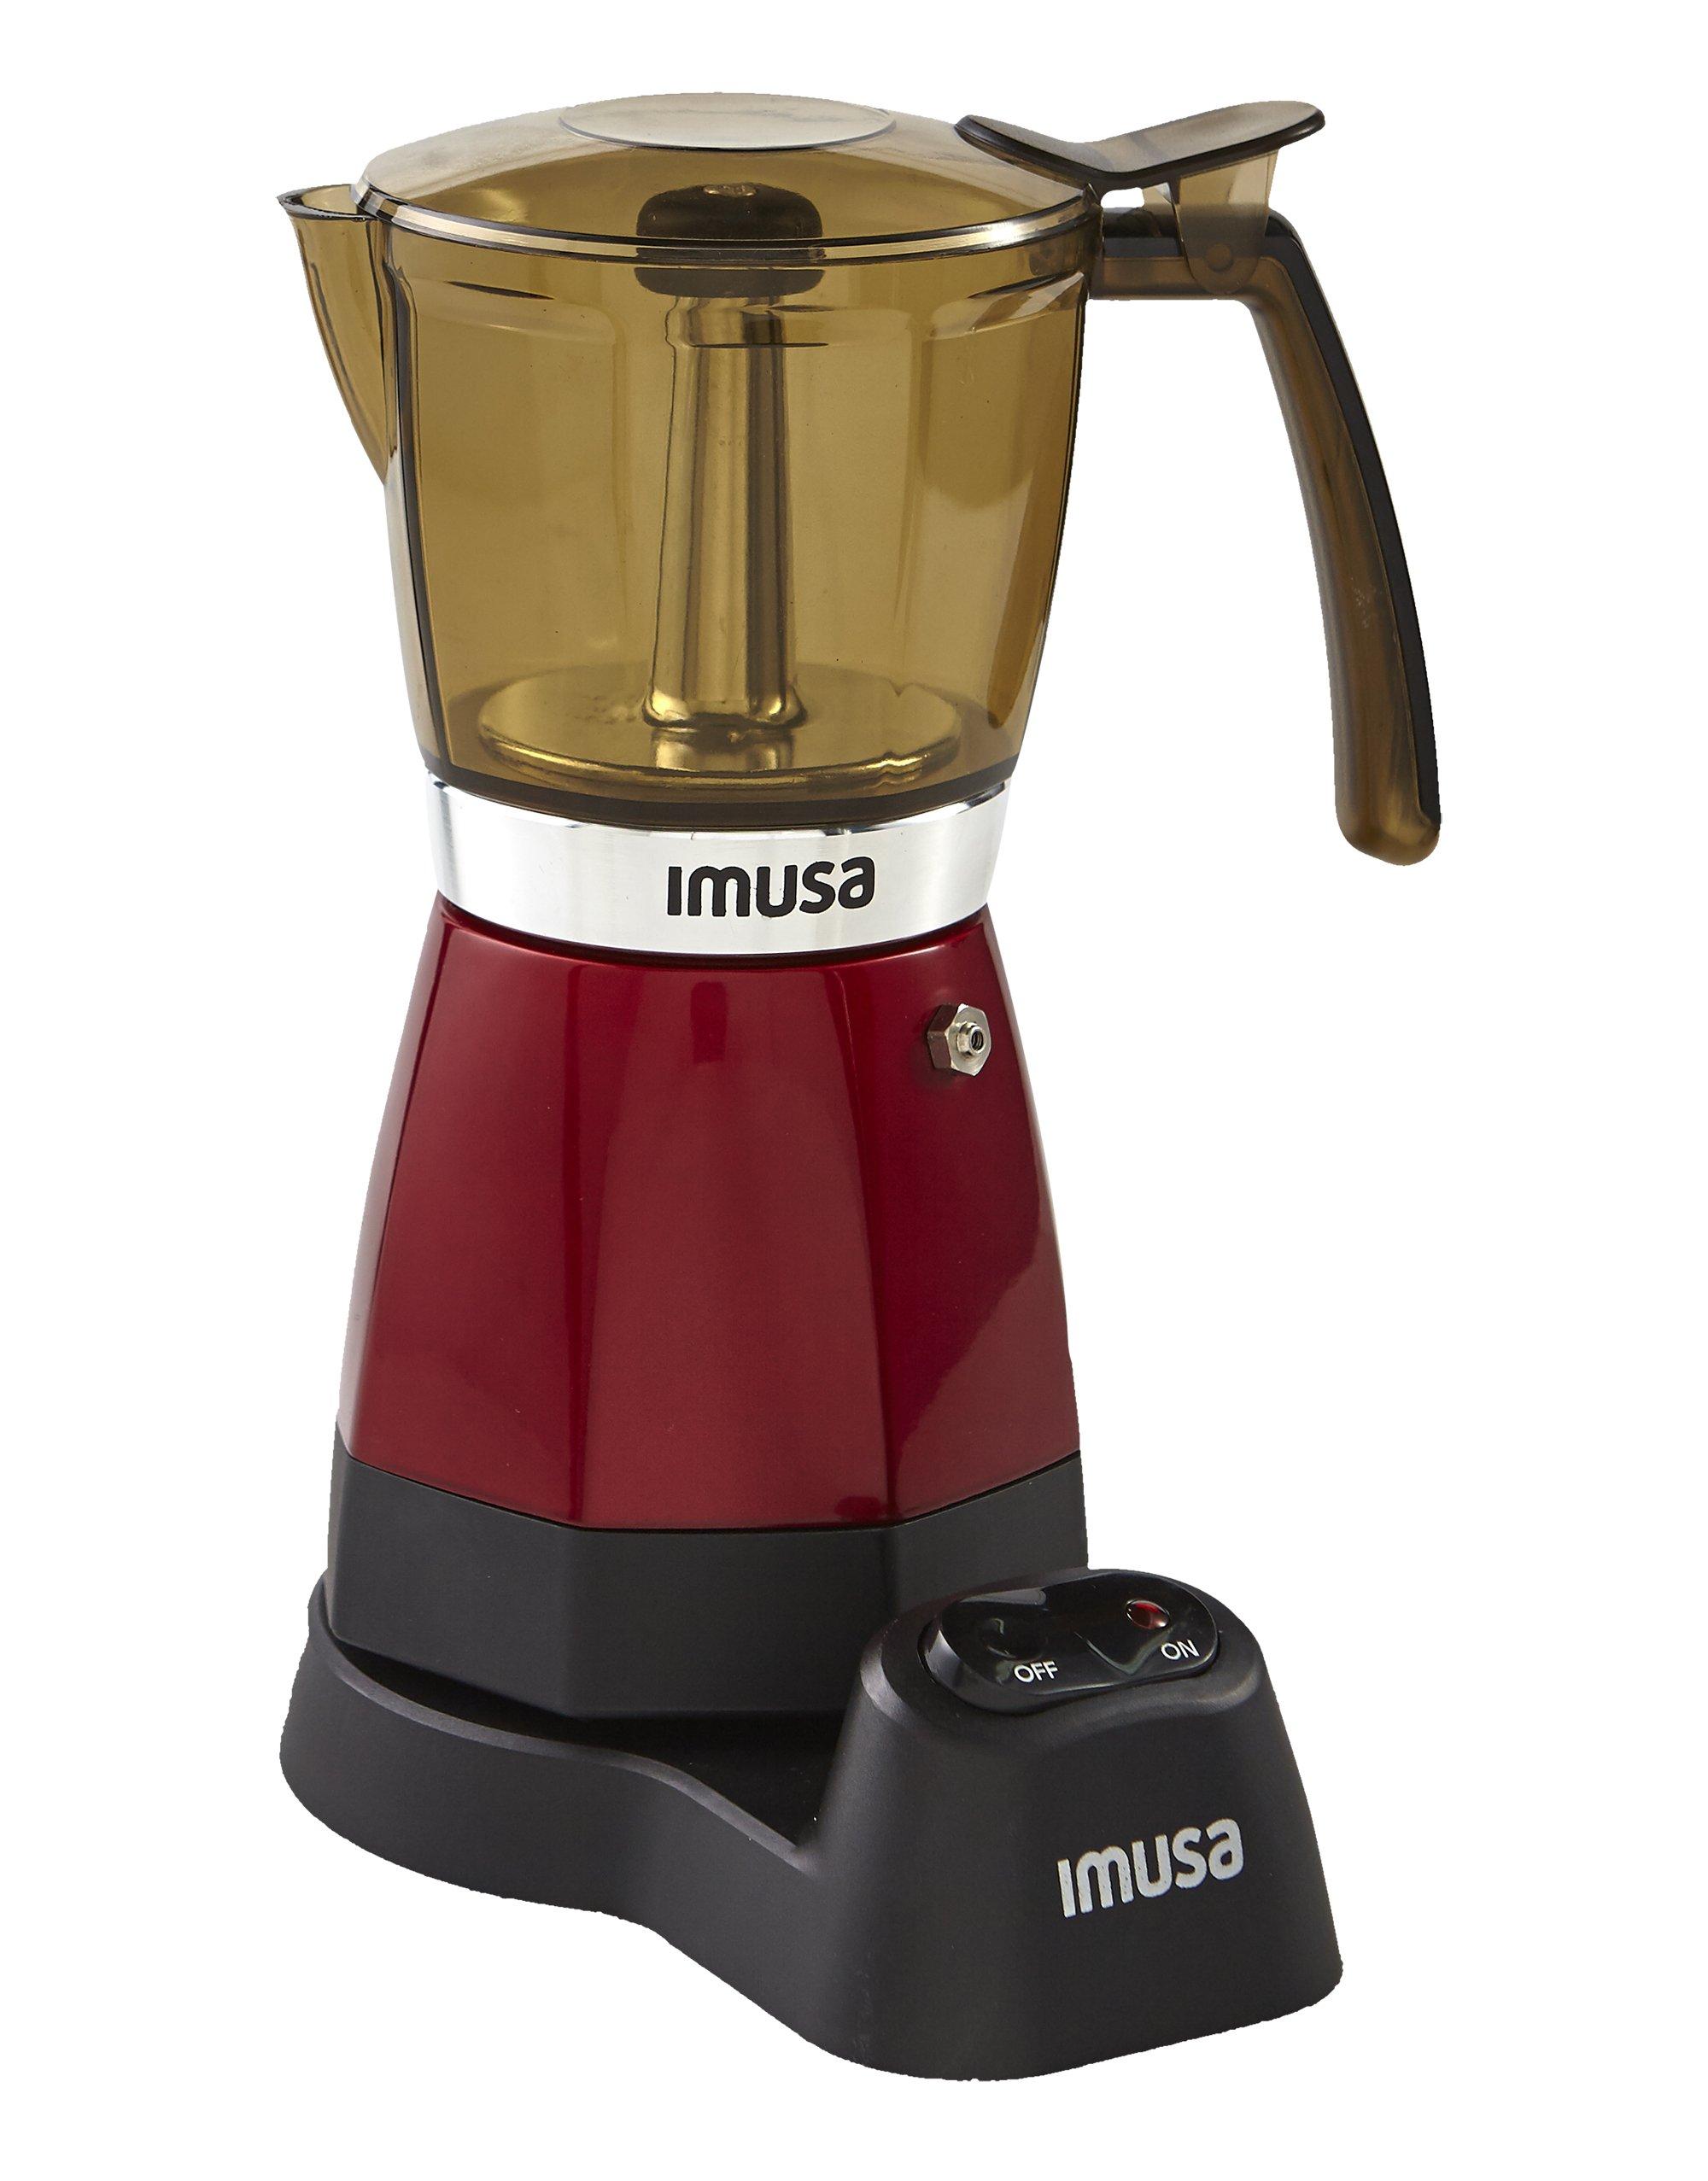 IMUSA USA B120-60008 Electric Espresso/Moka Maker, 3-6 Cups, Red by Imusa